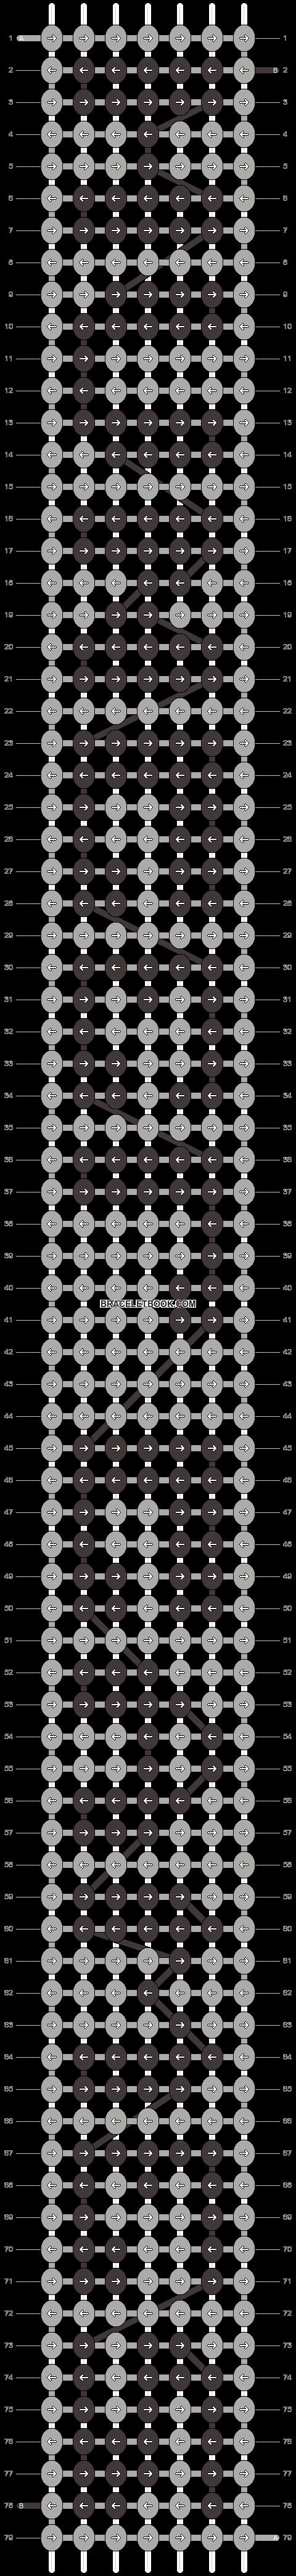 Alpha pattern #4457 pattern